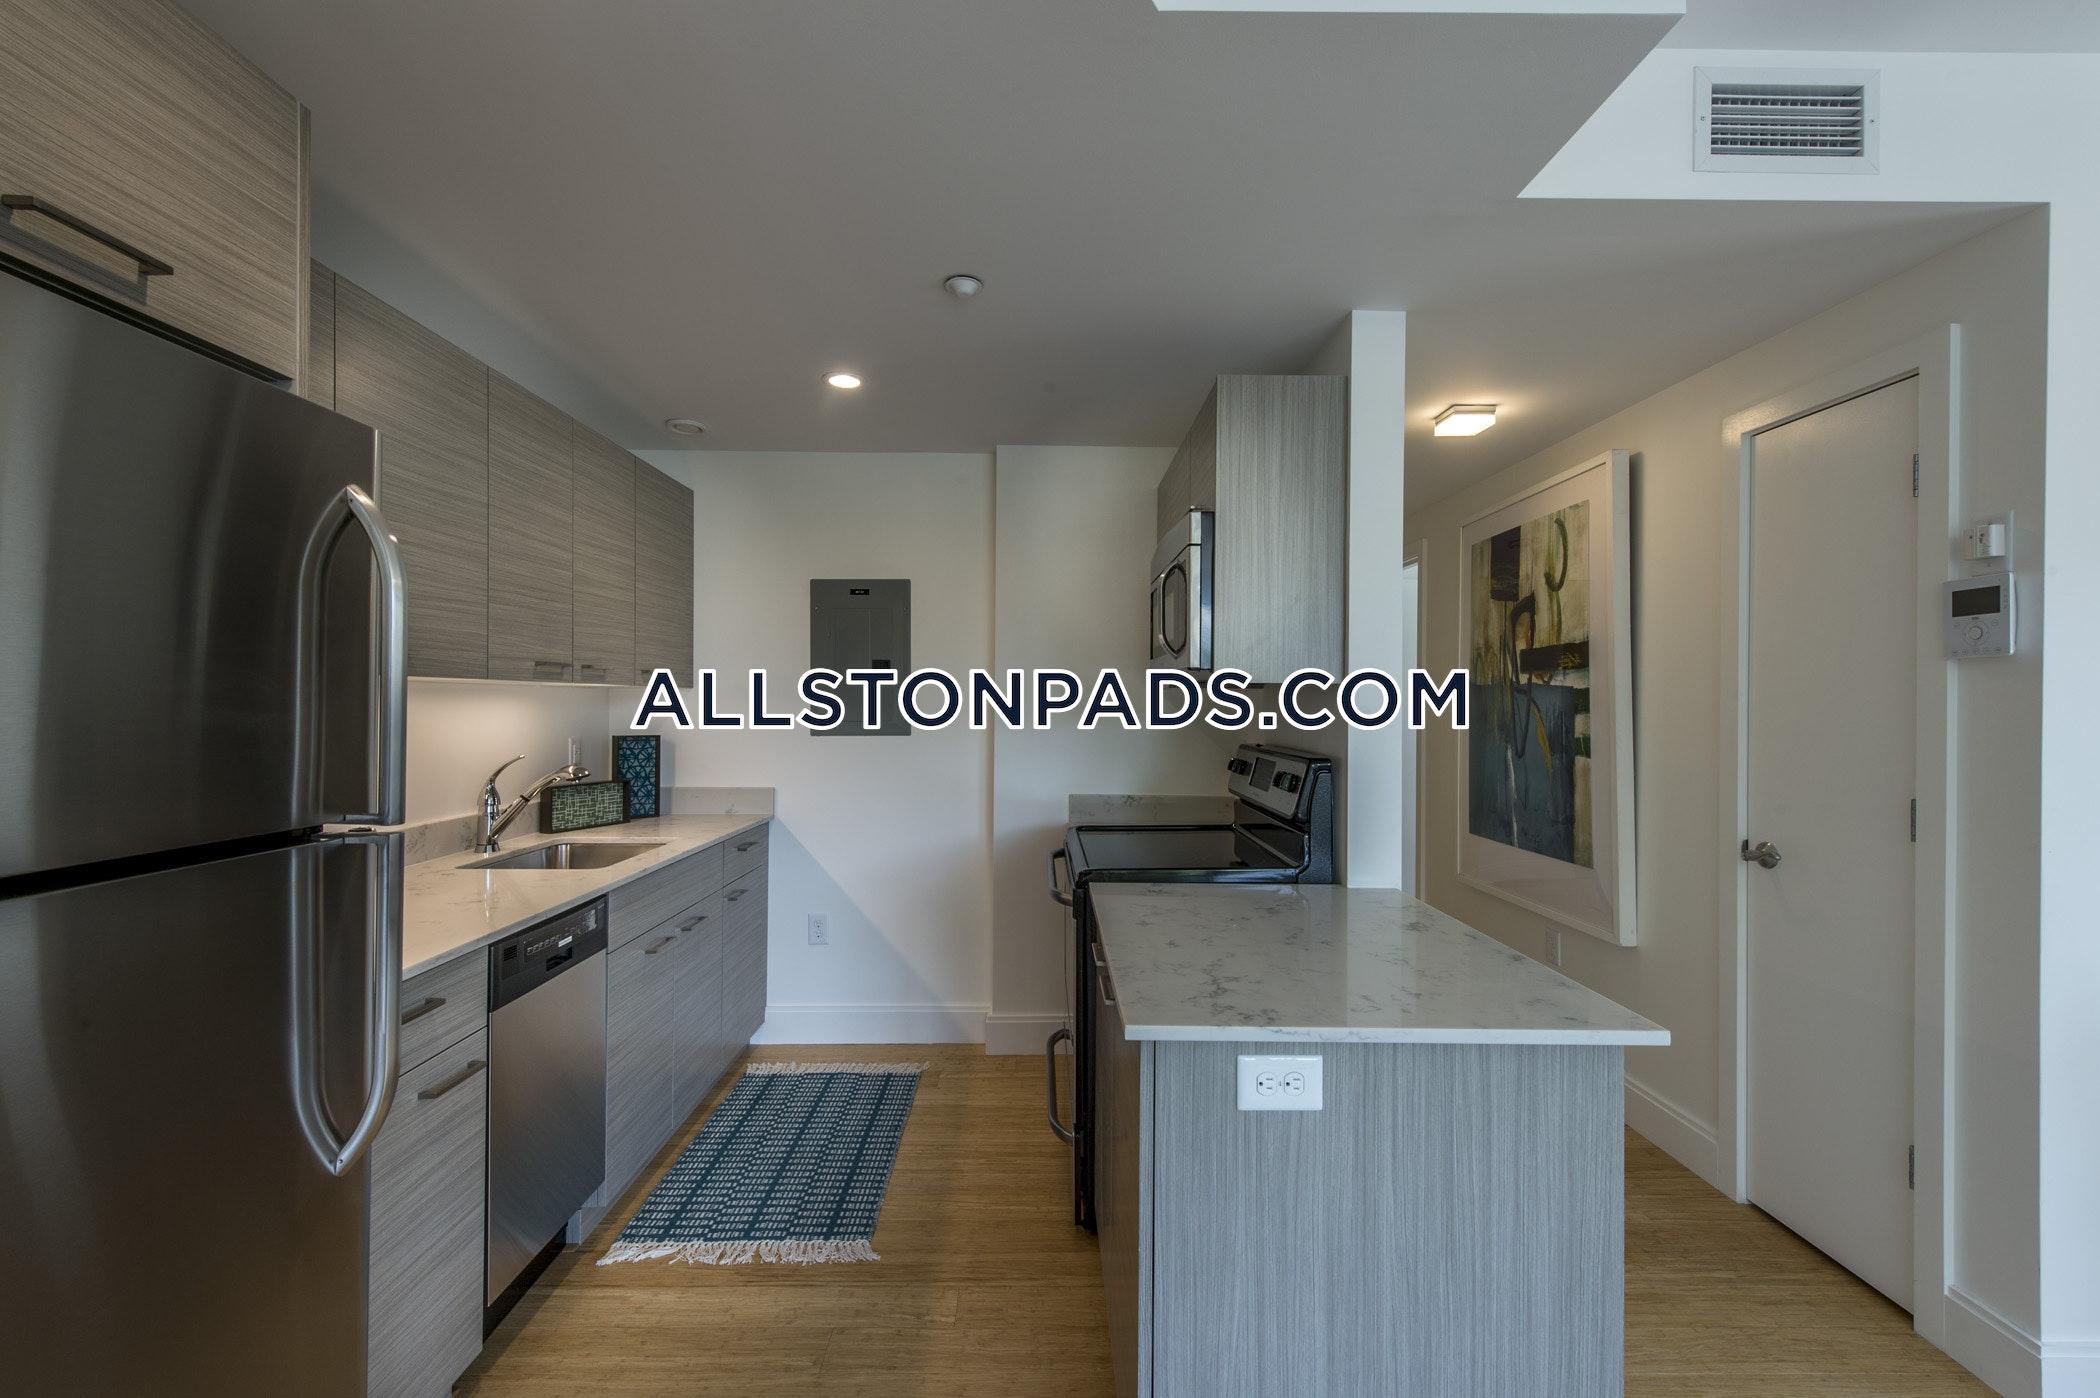 Allston 2 Beds 2 Baths Boston - $3,450